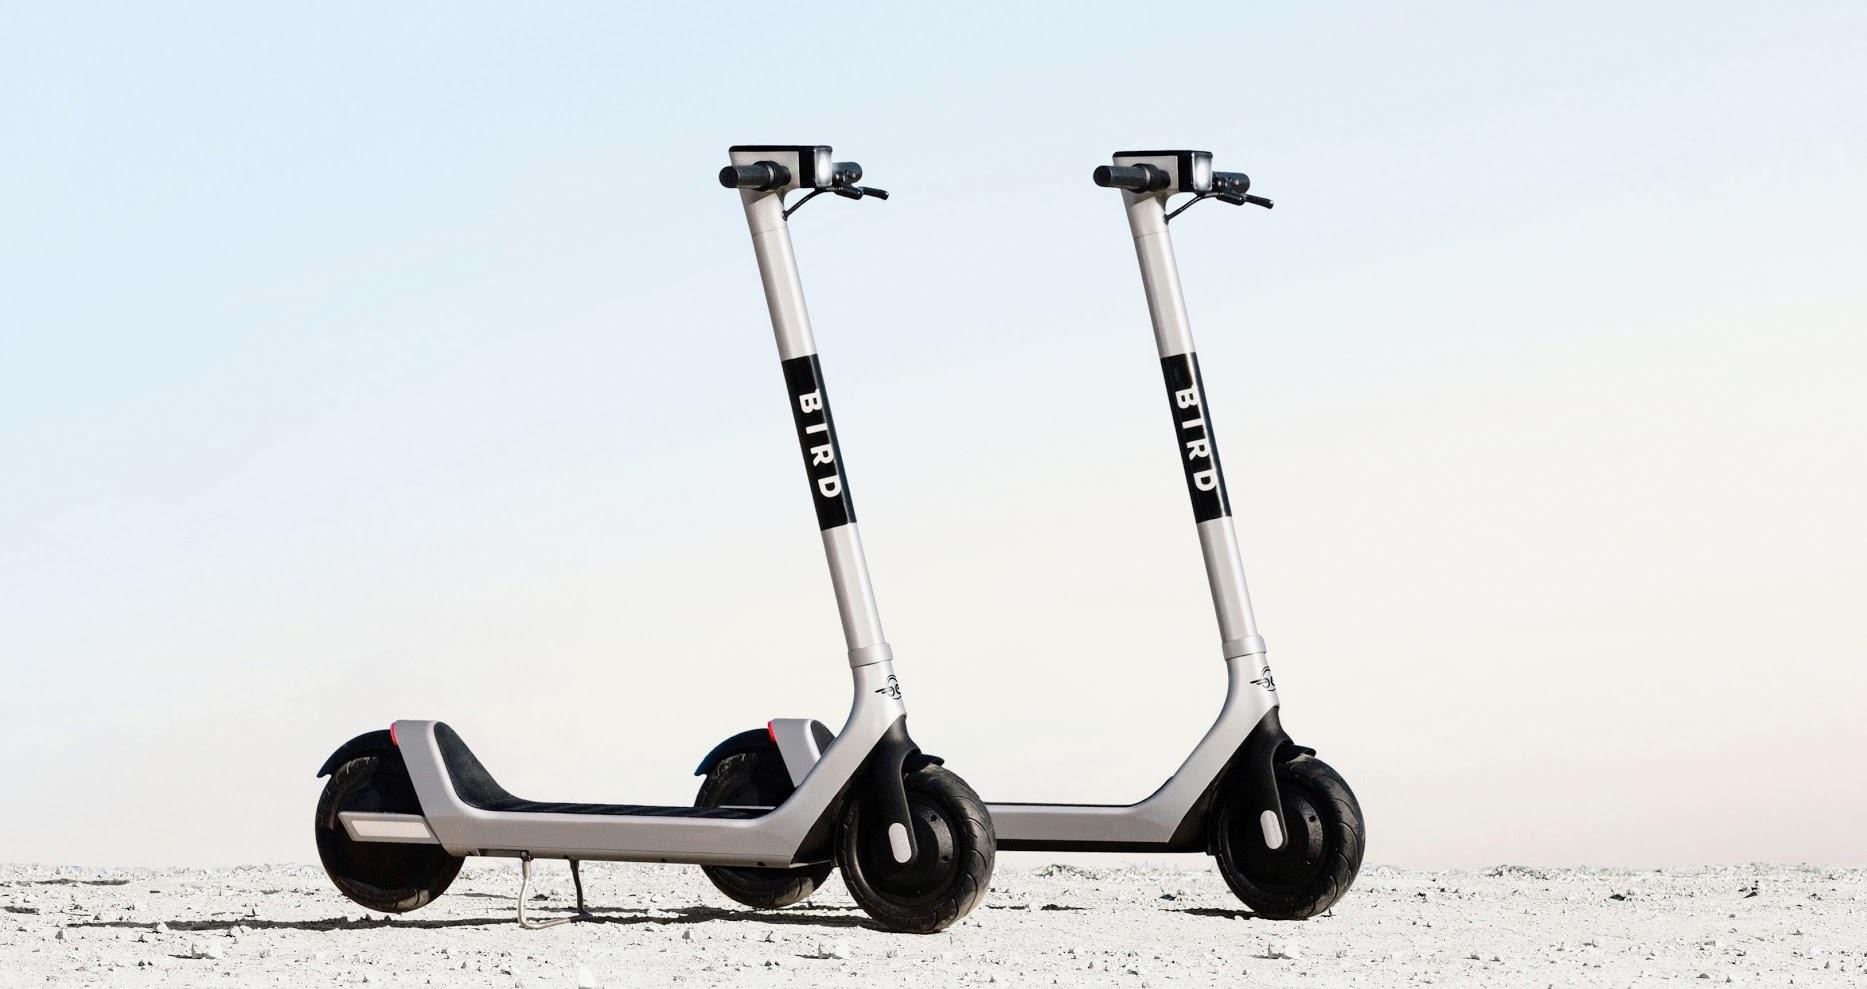 Reports: E-Scooter Company Bird Explores Potential SPAC